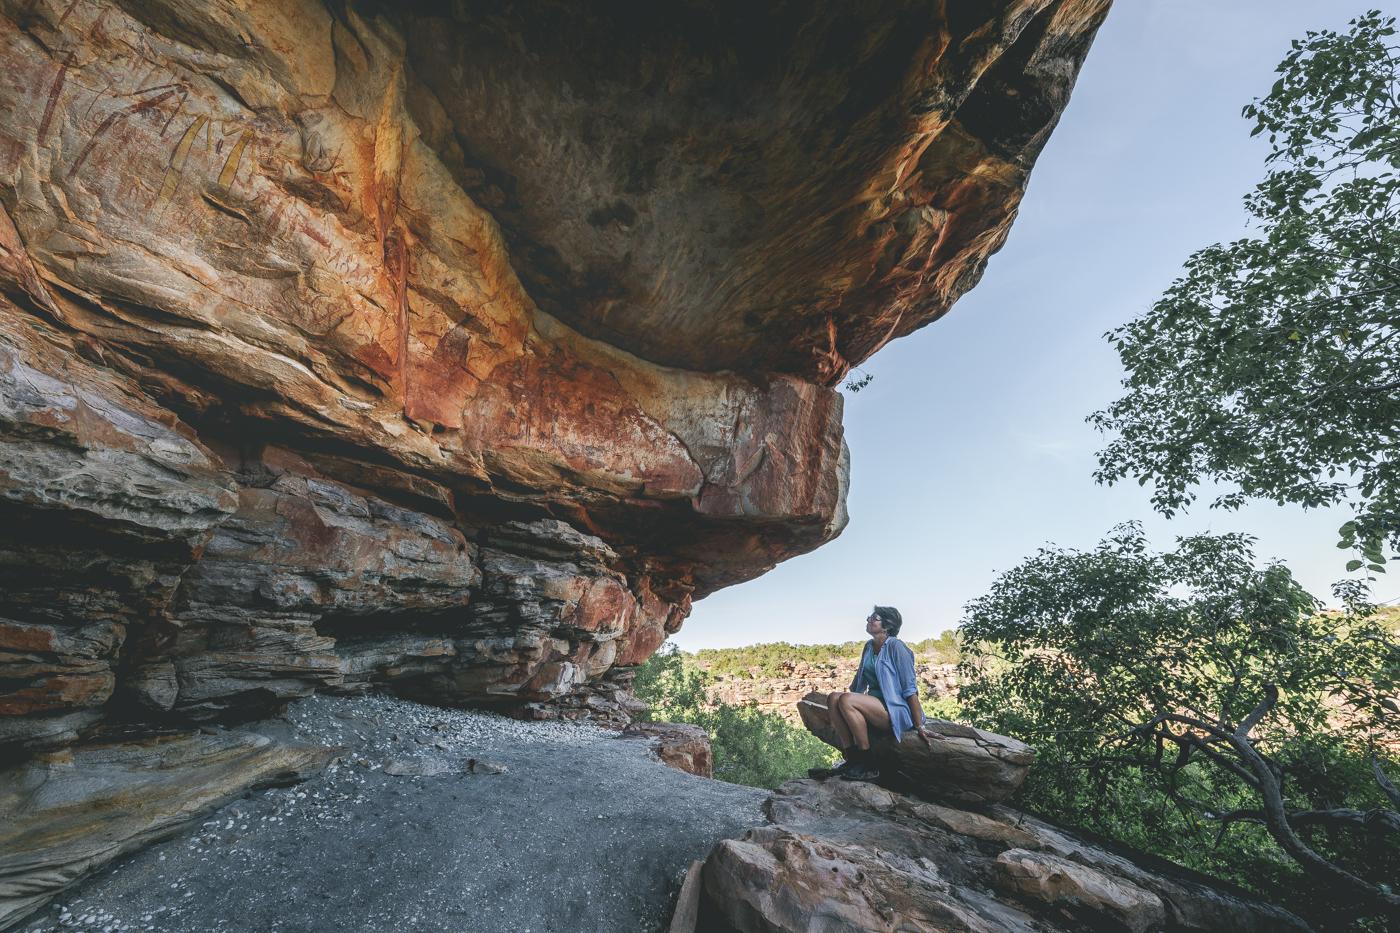 Indigenous Kimberley rock art, pic by Landi Bradshaw